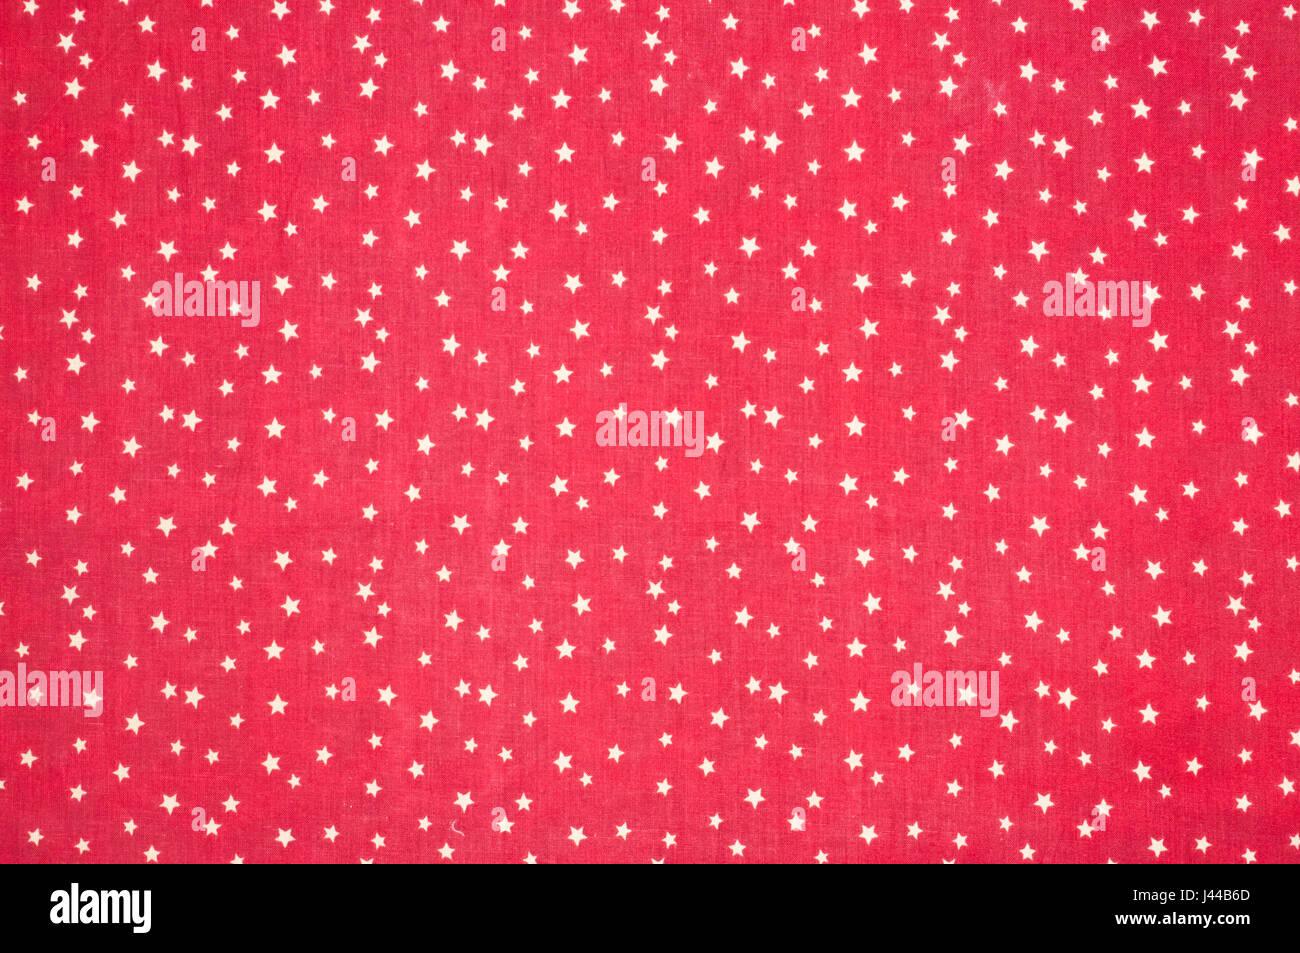 65916cc898b122 Weiße Sterne Stockfotos & Weiße Sterne Bilder - Alamy